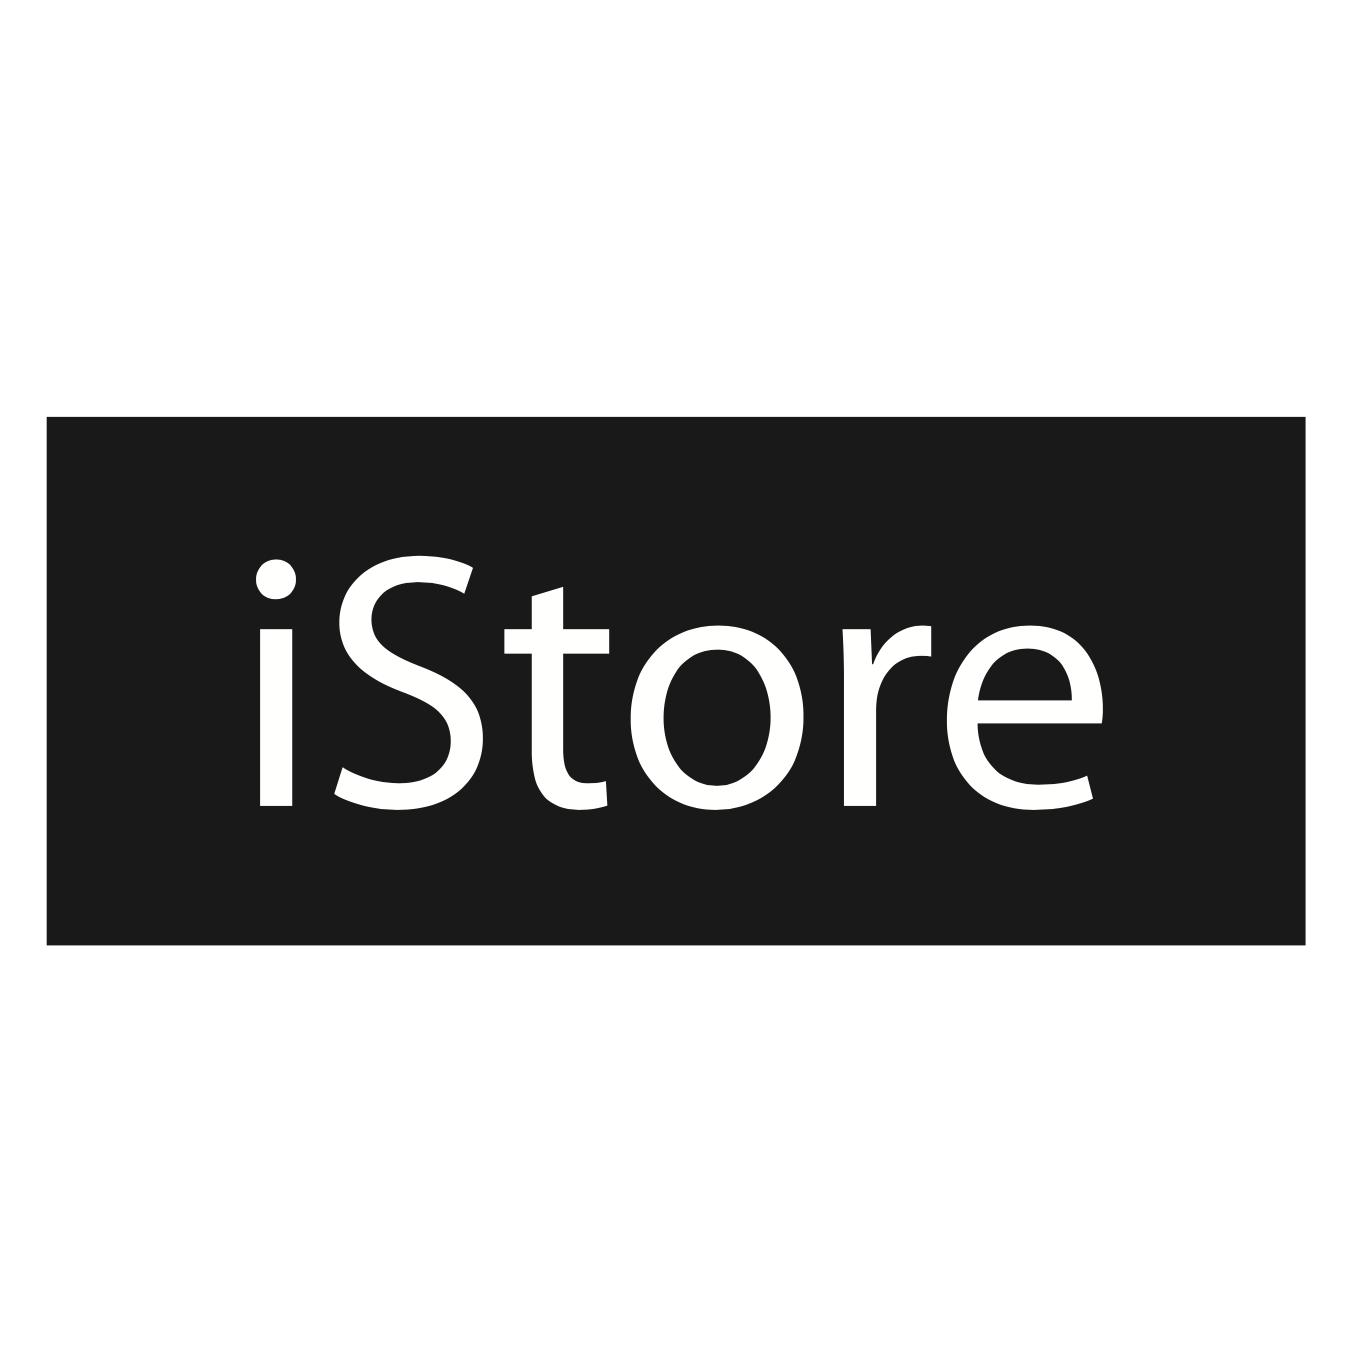 iPhone X Silicone Case - White